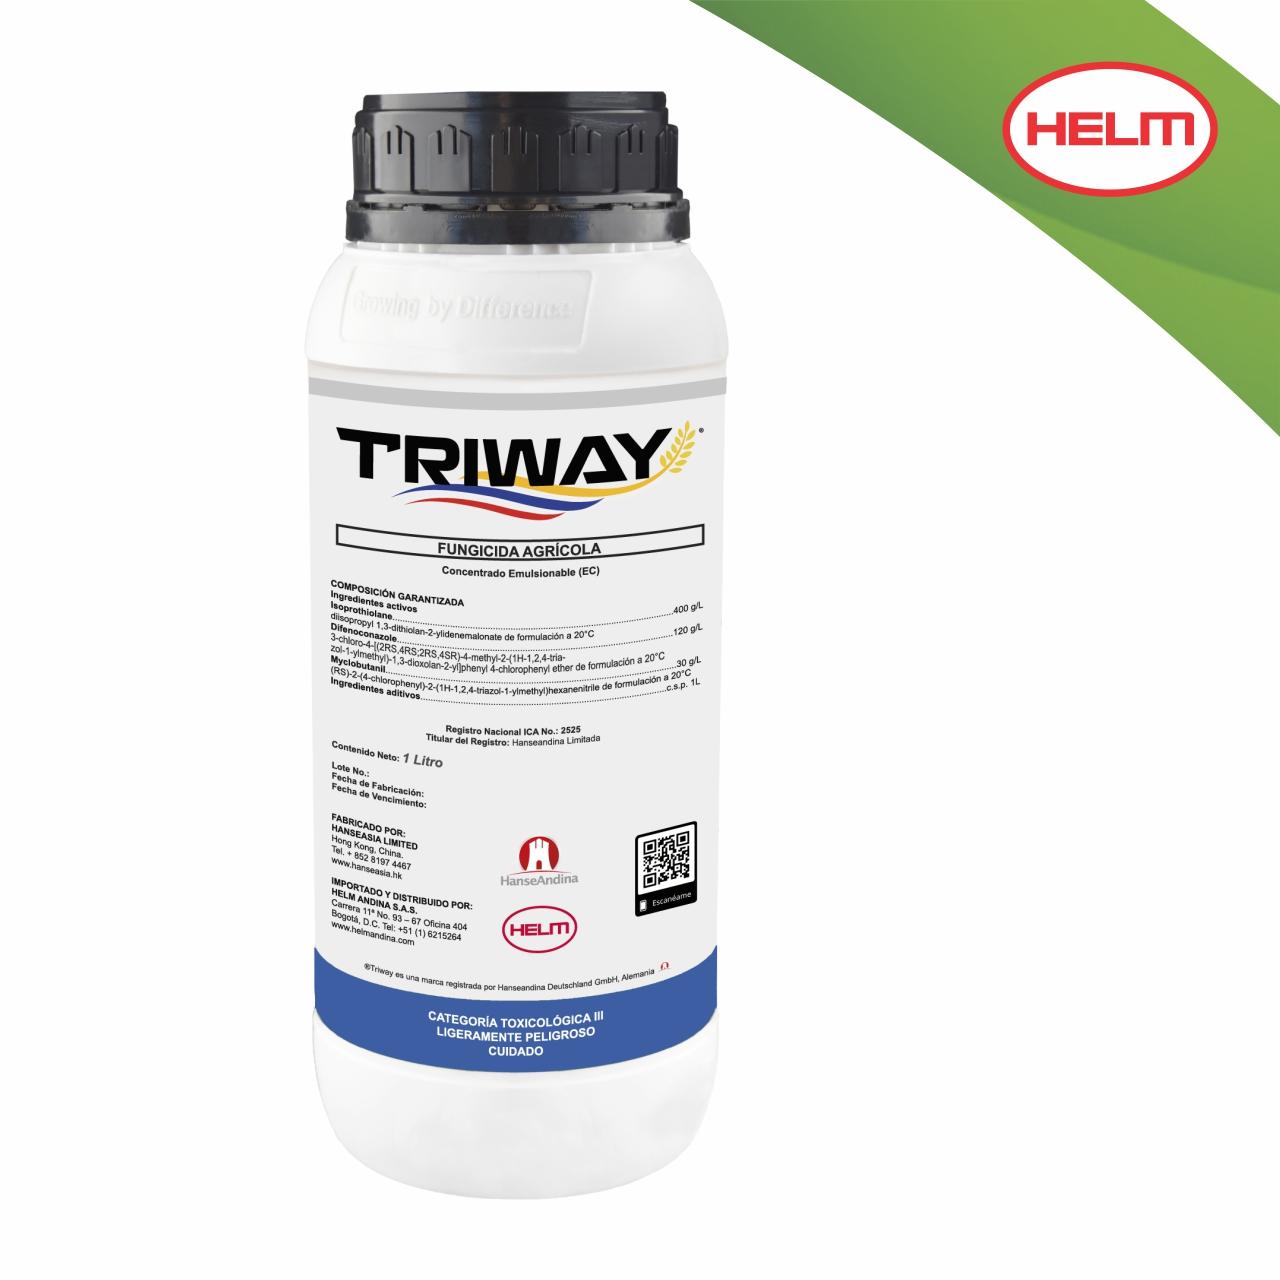 Fungicida triway helm andina